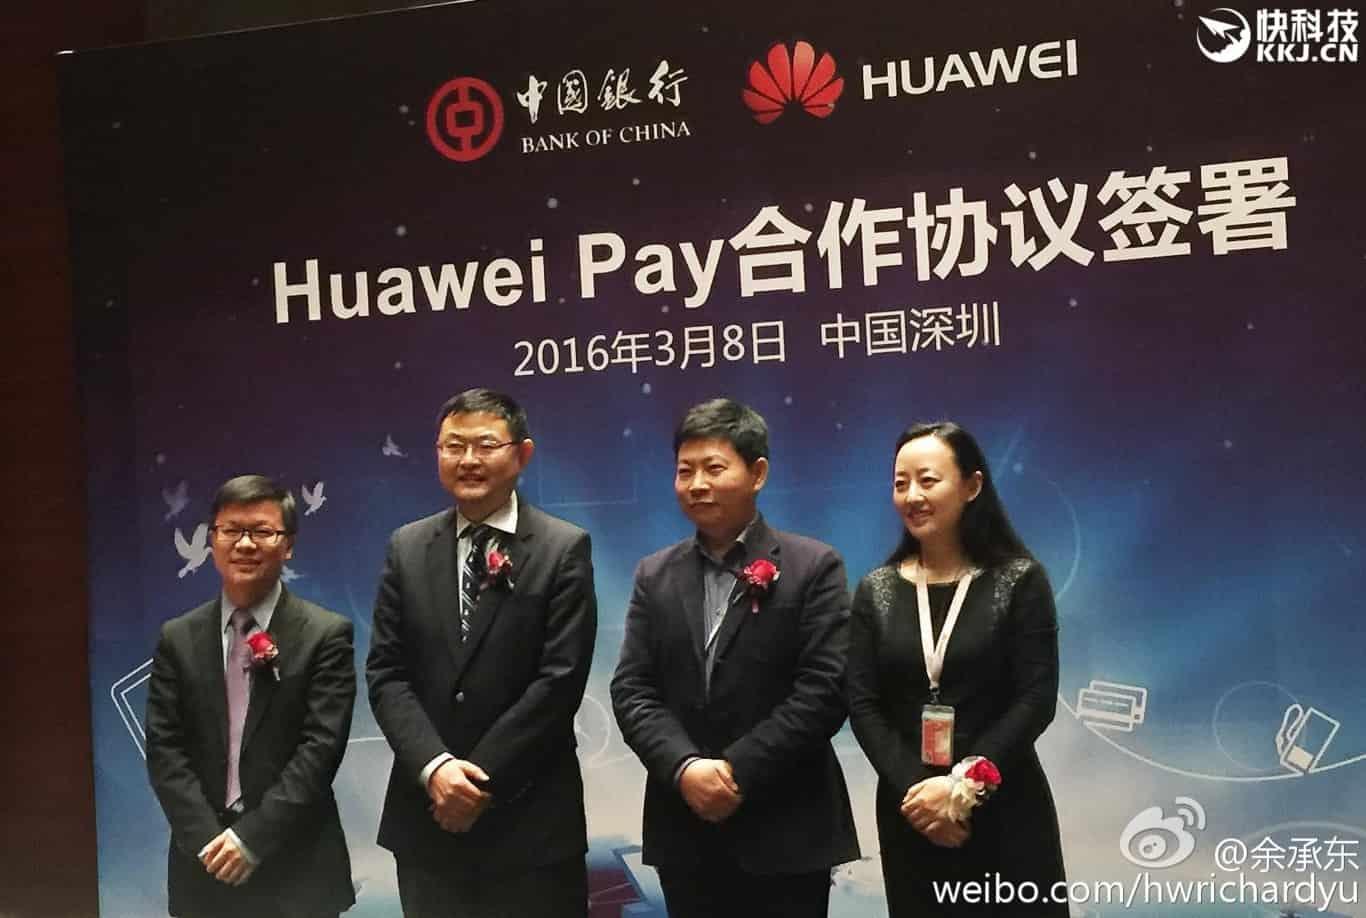 presentacion-huawei-pay-pagos-android-tecnologiamaestro-min